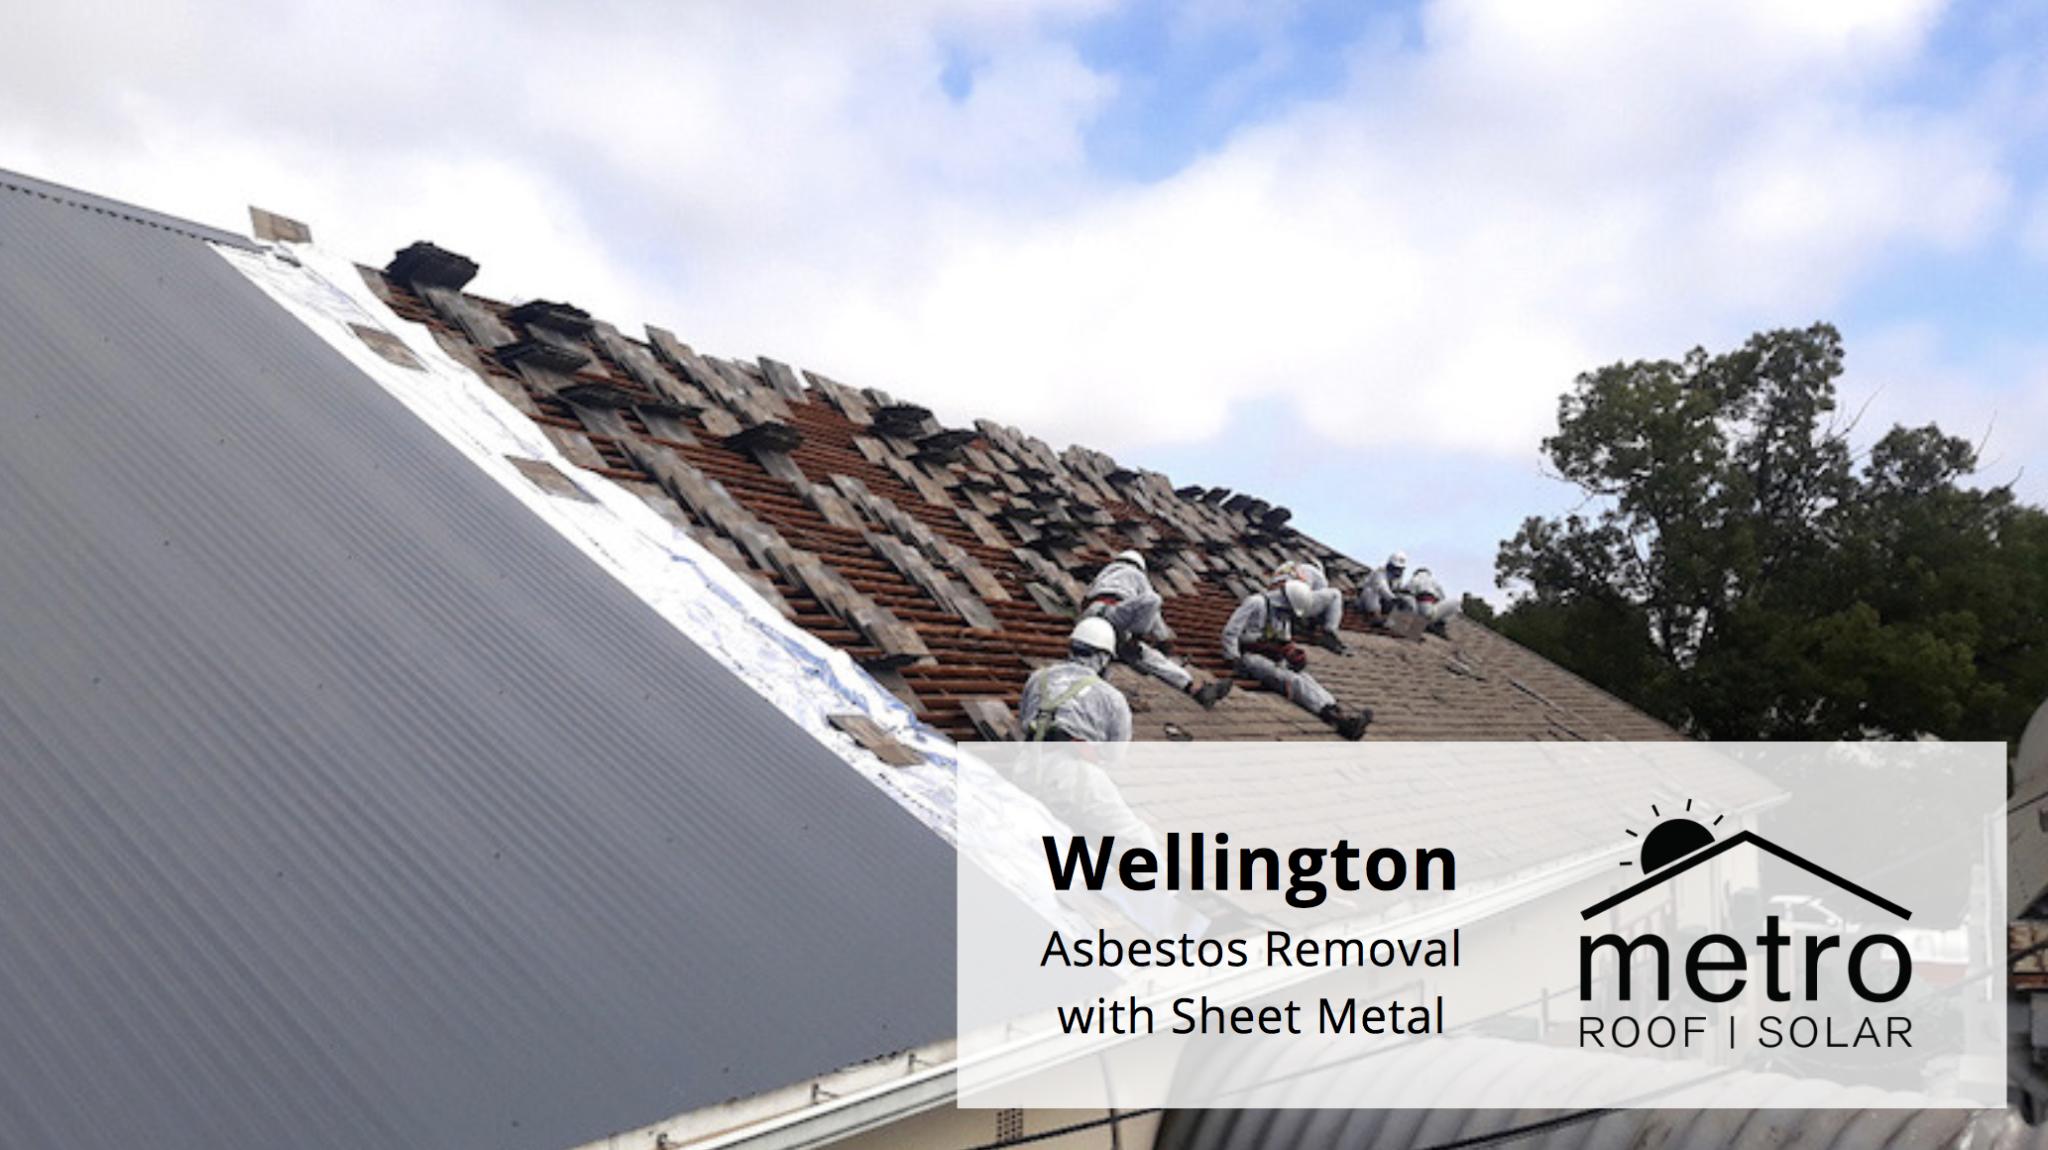 Asbestos Removal in Wellington